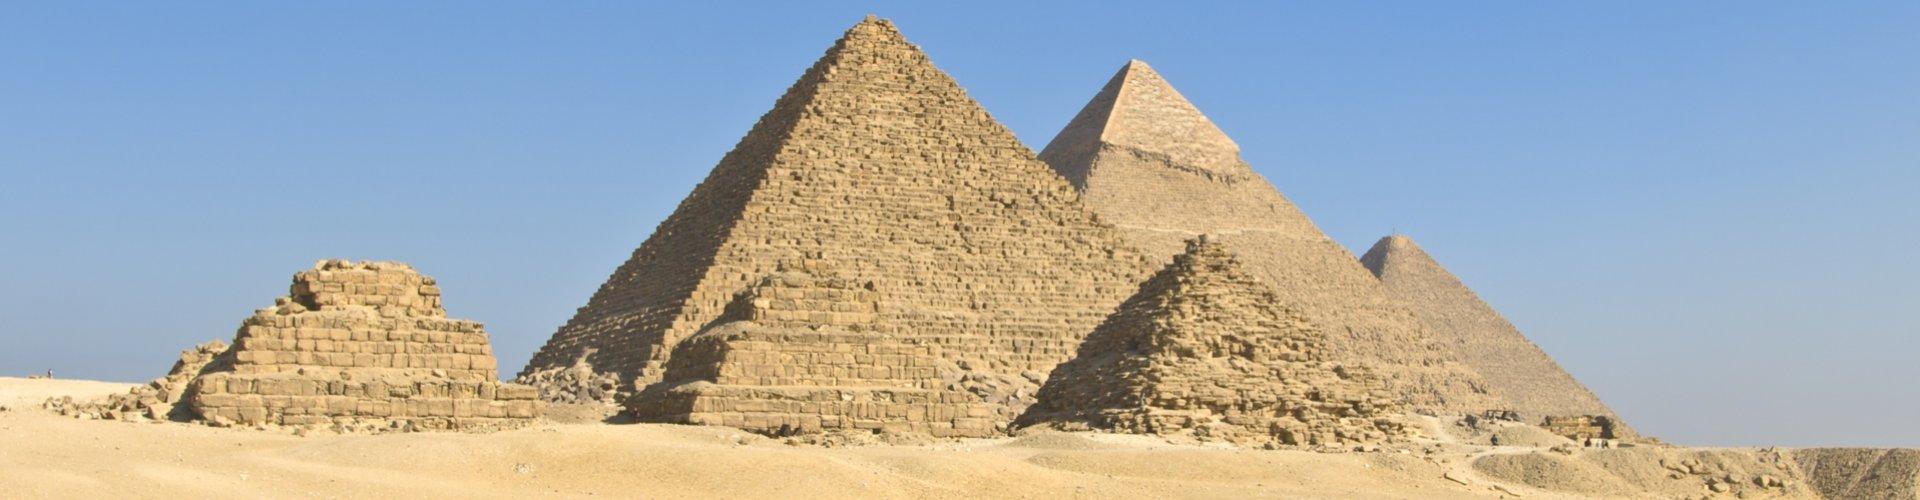 Familienurlaub in Ägypten